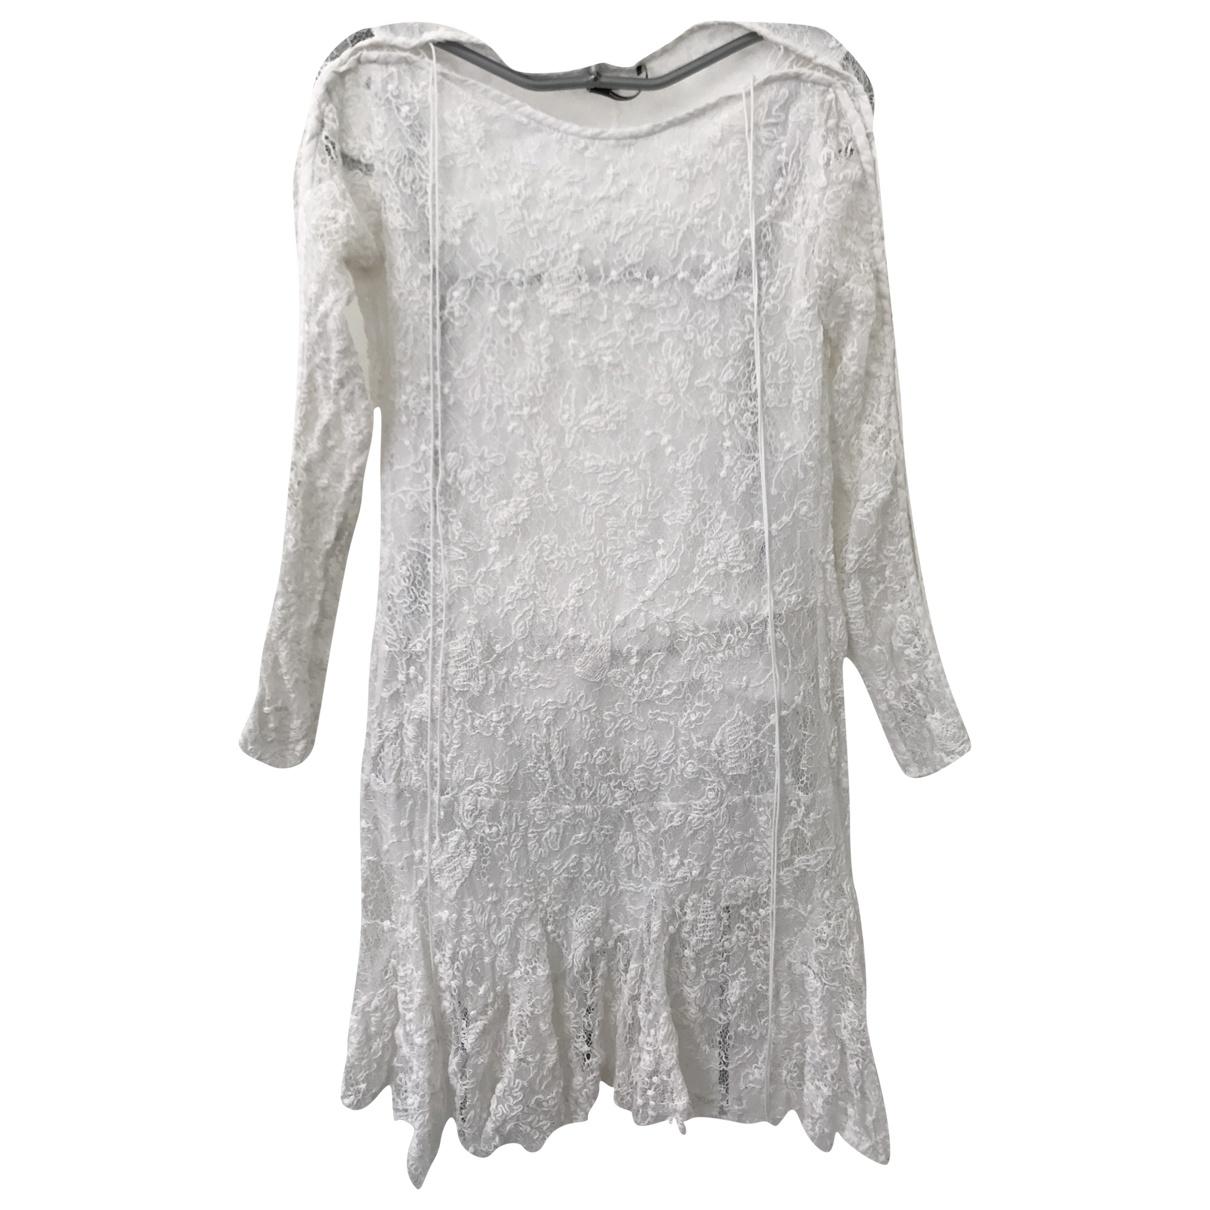 Isabel Marant \N White Lace dress for Women 42 FR